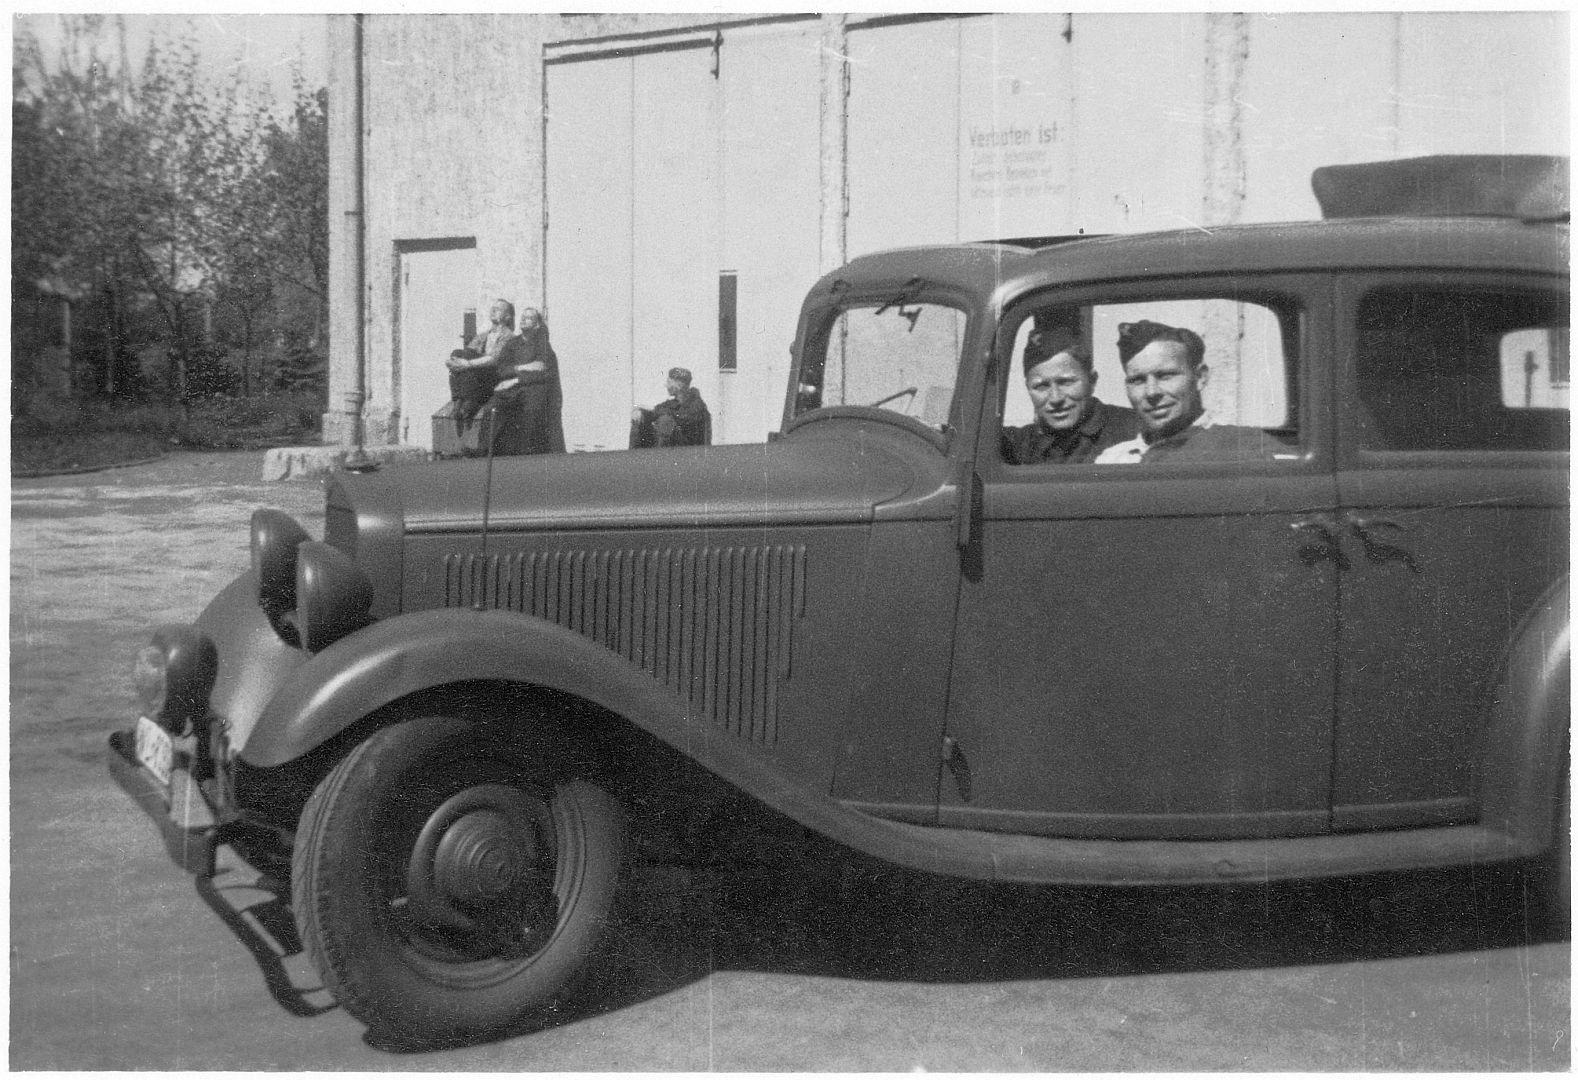 Mercedes_200_Limousine_1934_WH_Galerie